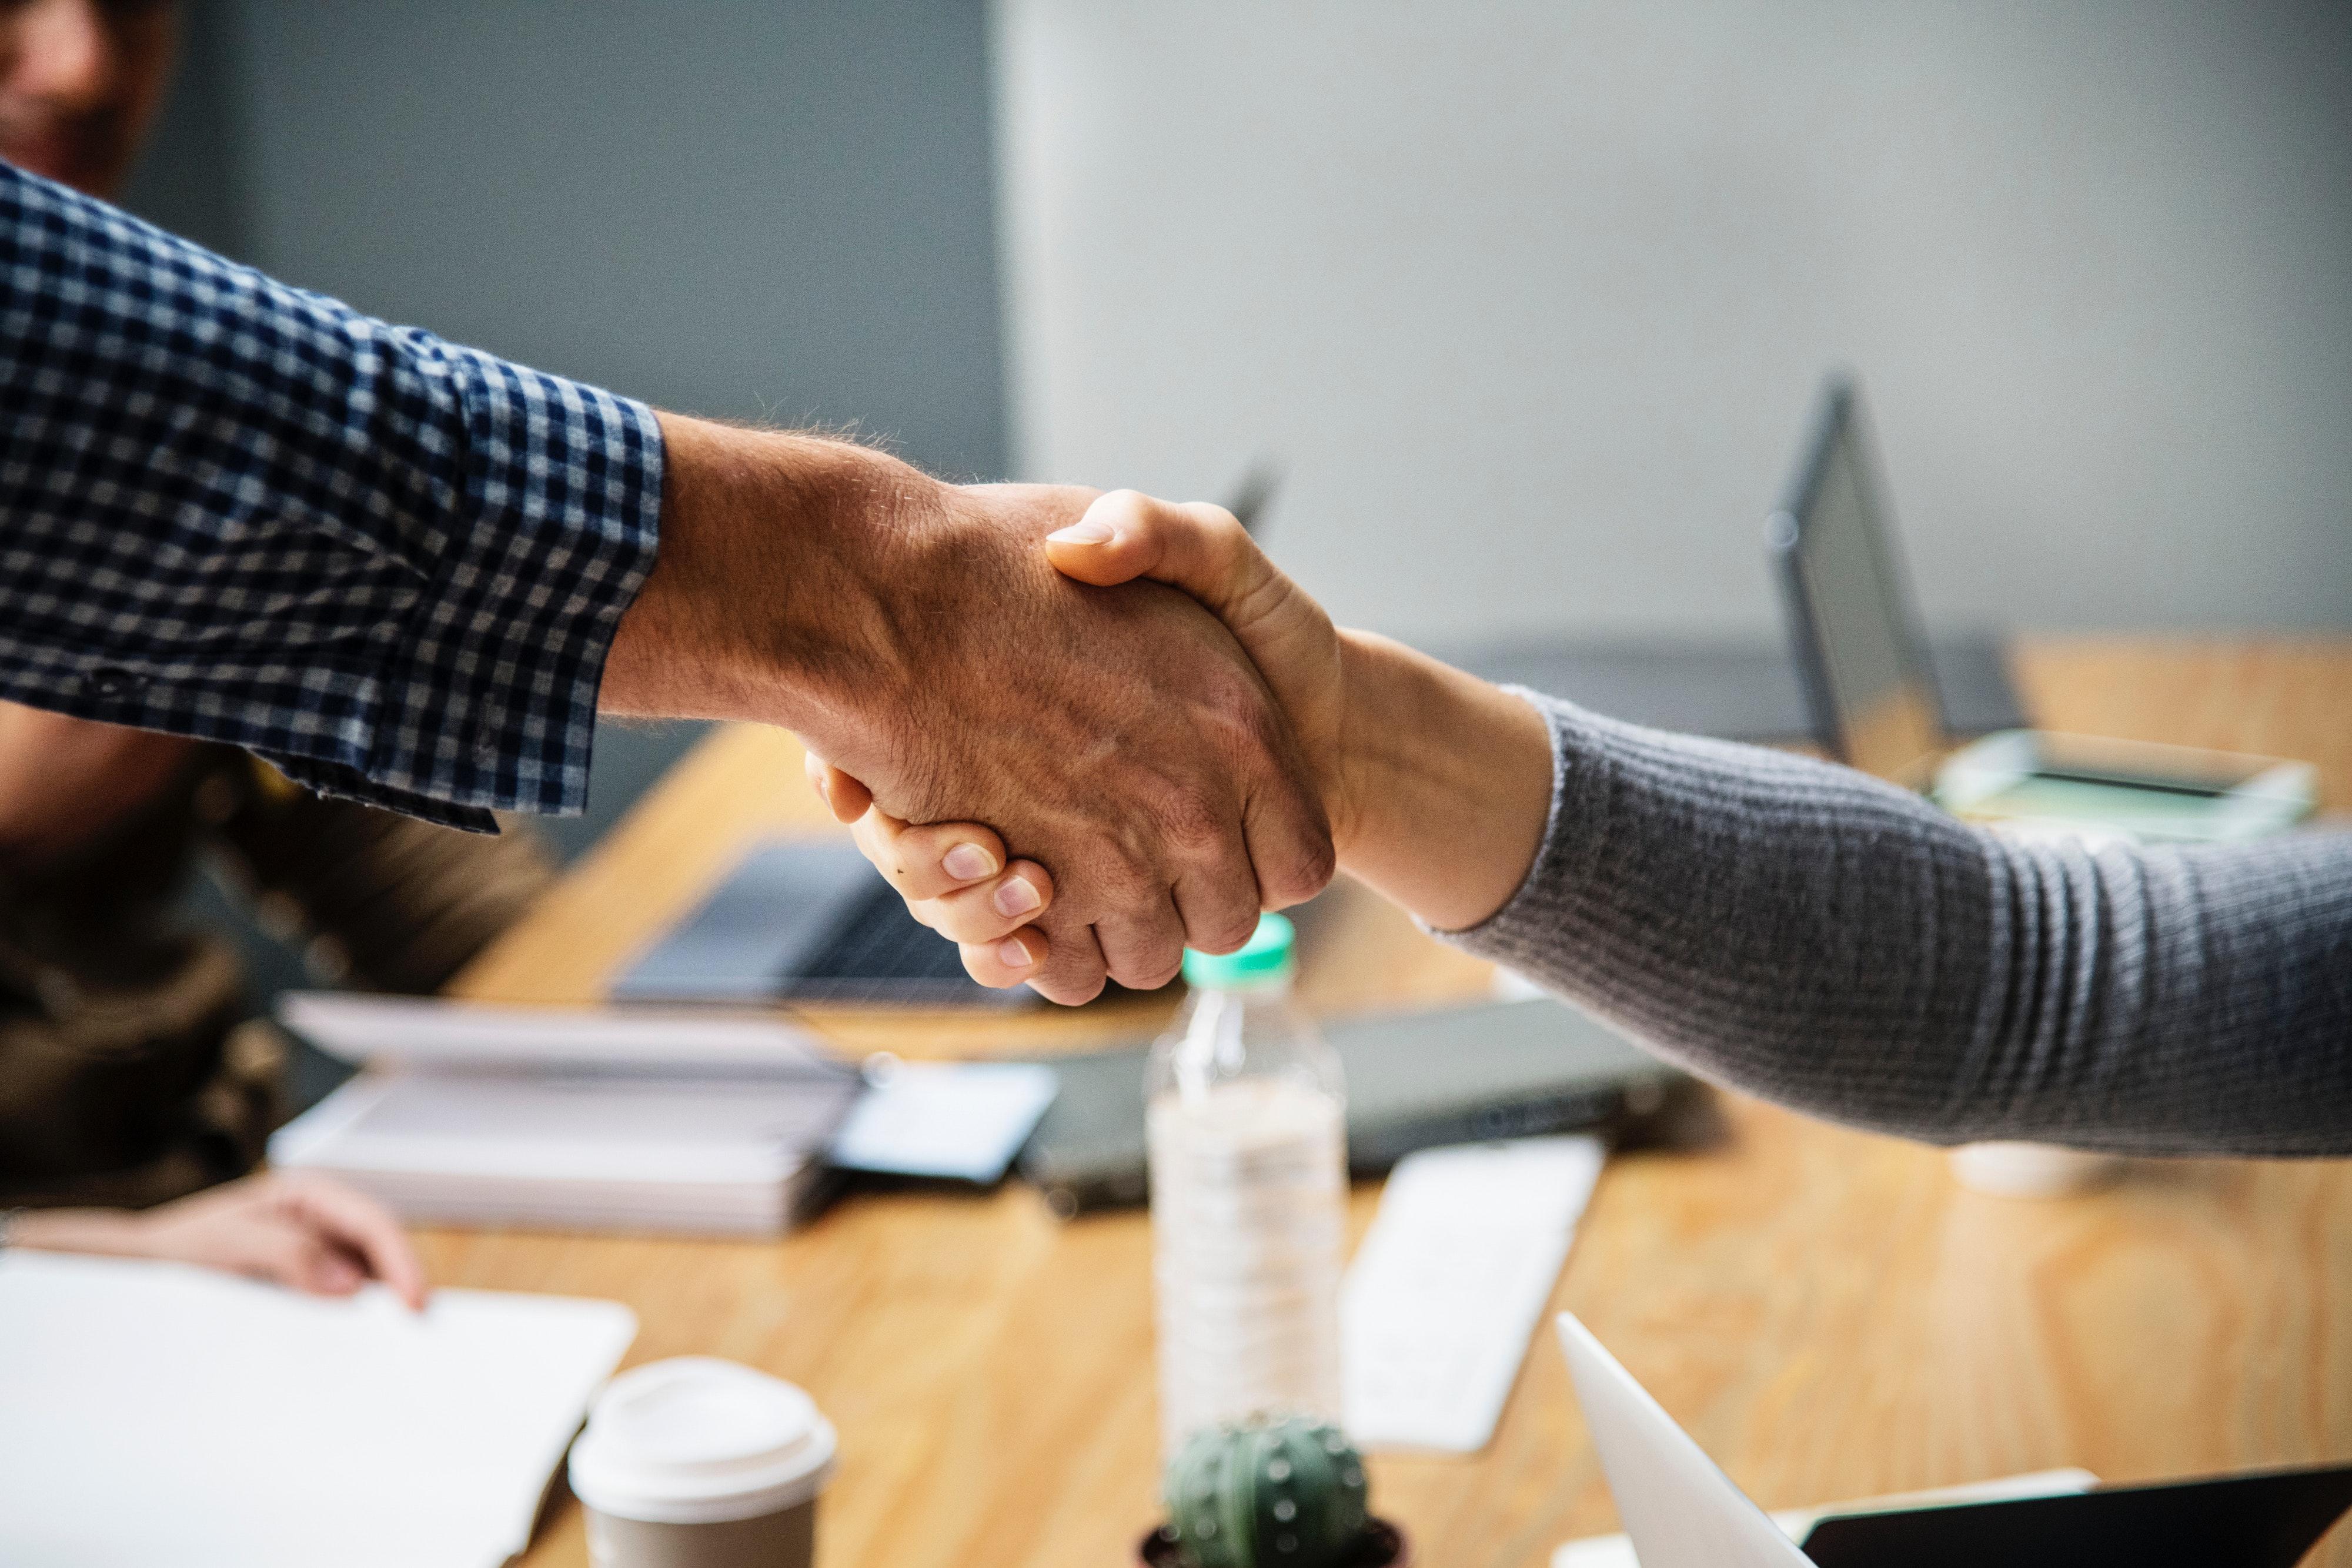 ProfessionalServices_Sector_Handshake 1